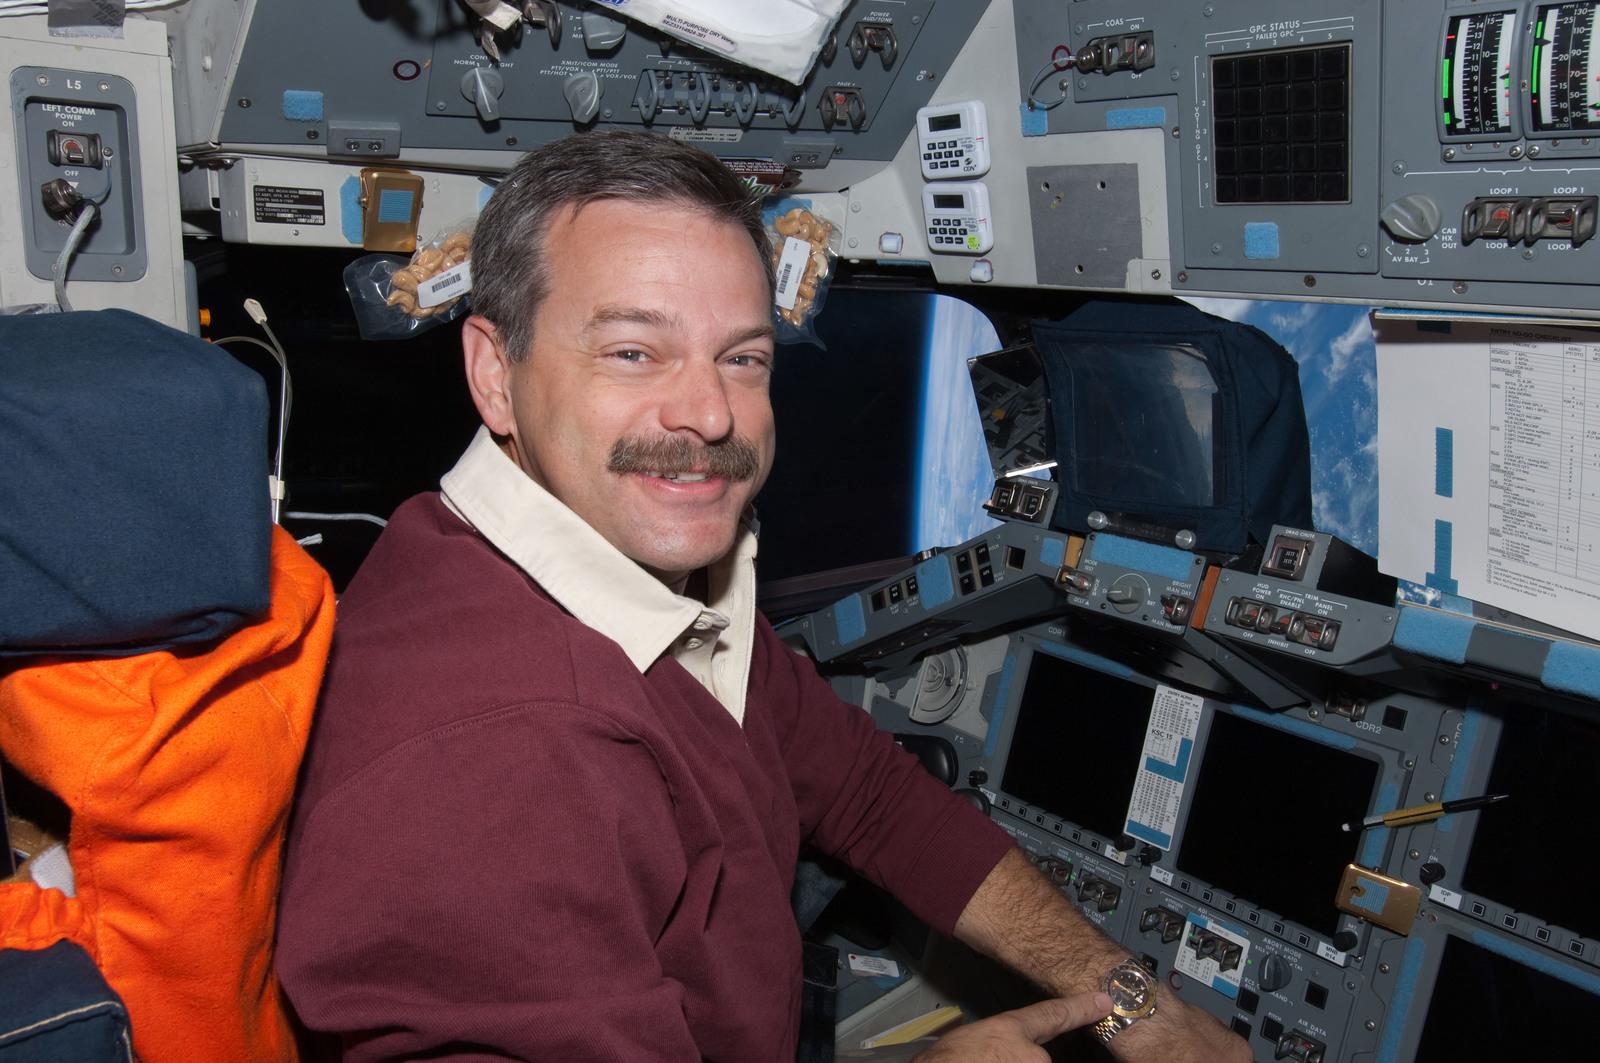 S125E013890 - STS-125 - View of STS-125 Commander Scott Altman on the Flight Deck